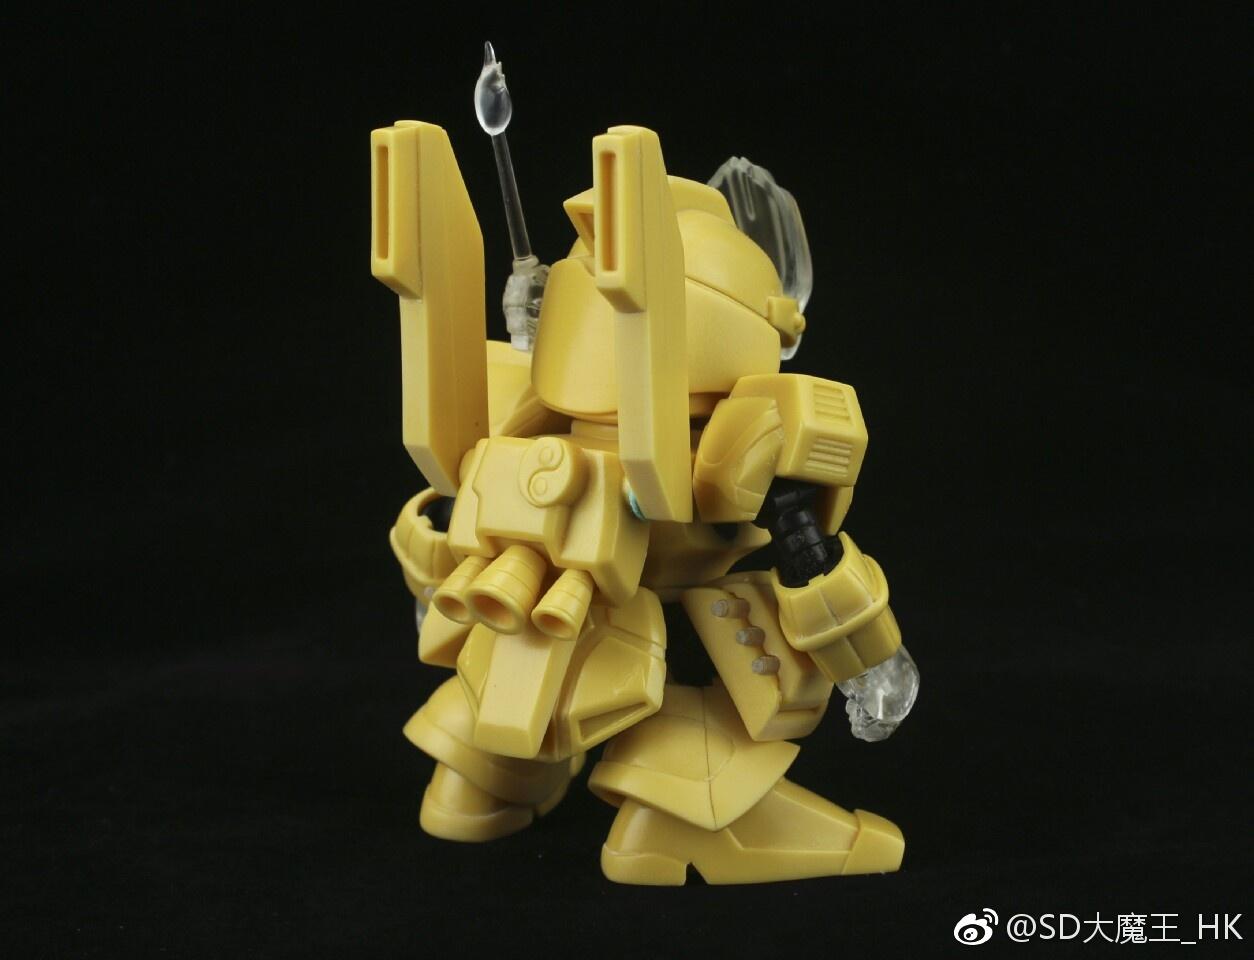 G236_jyo_sd_daimaou_inask_011.jpg